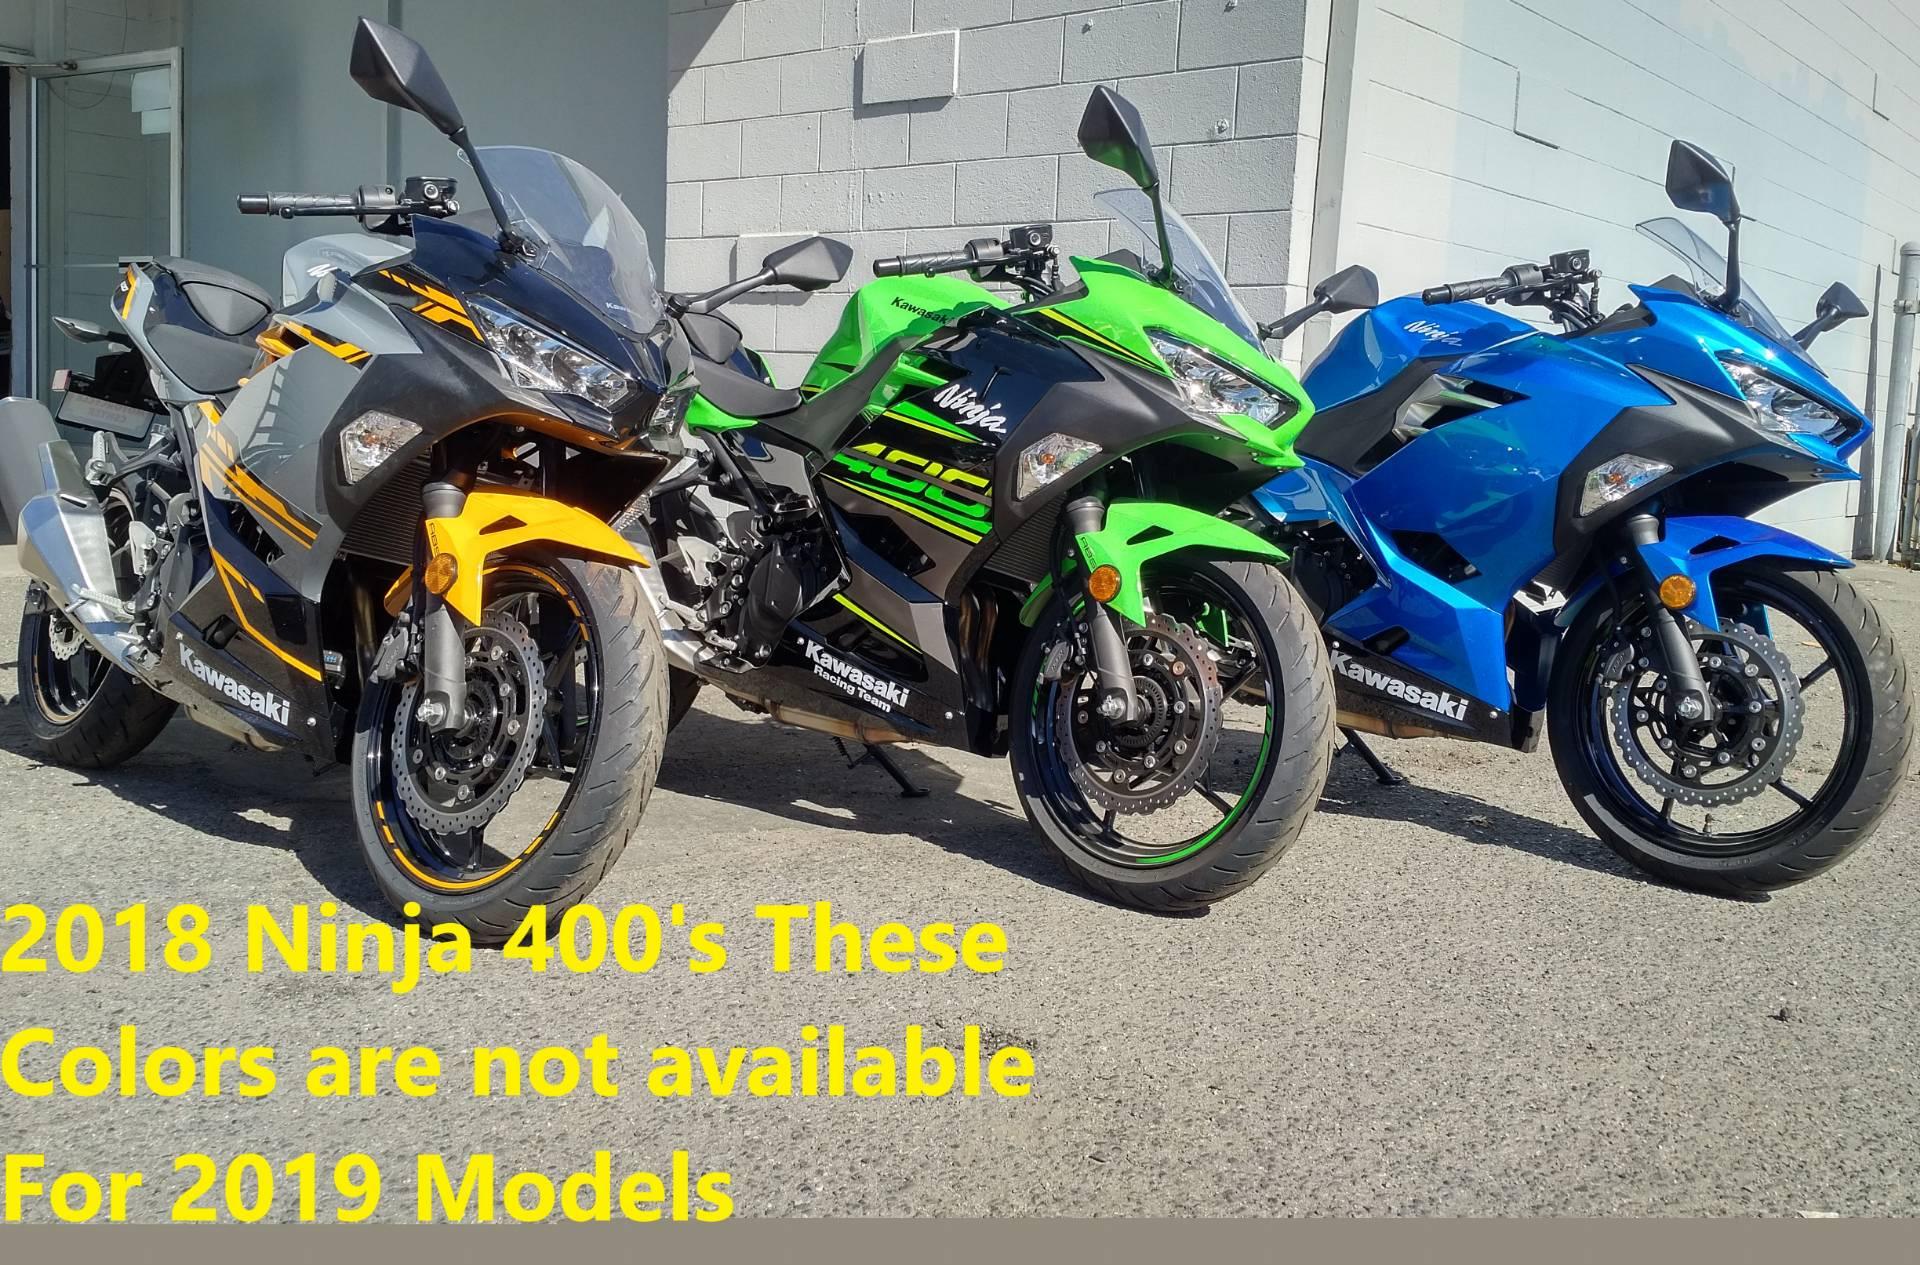 2018 Kawasaki Ninja 400 for sale 2490